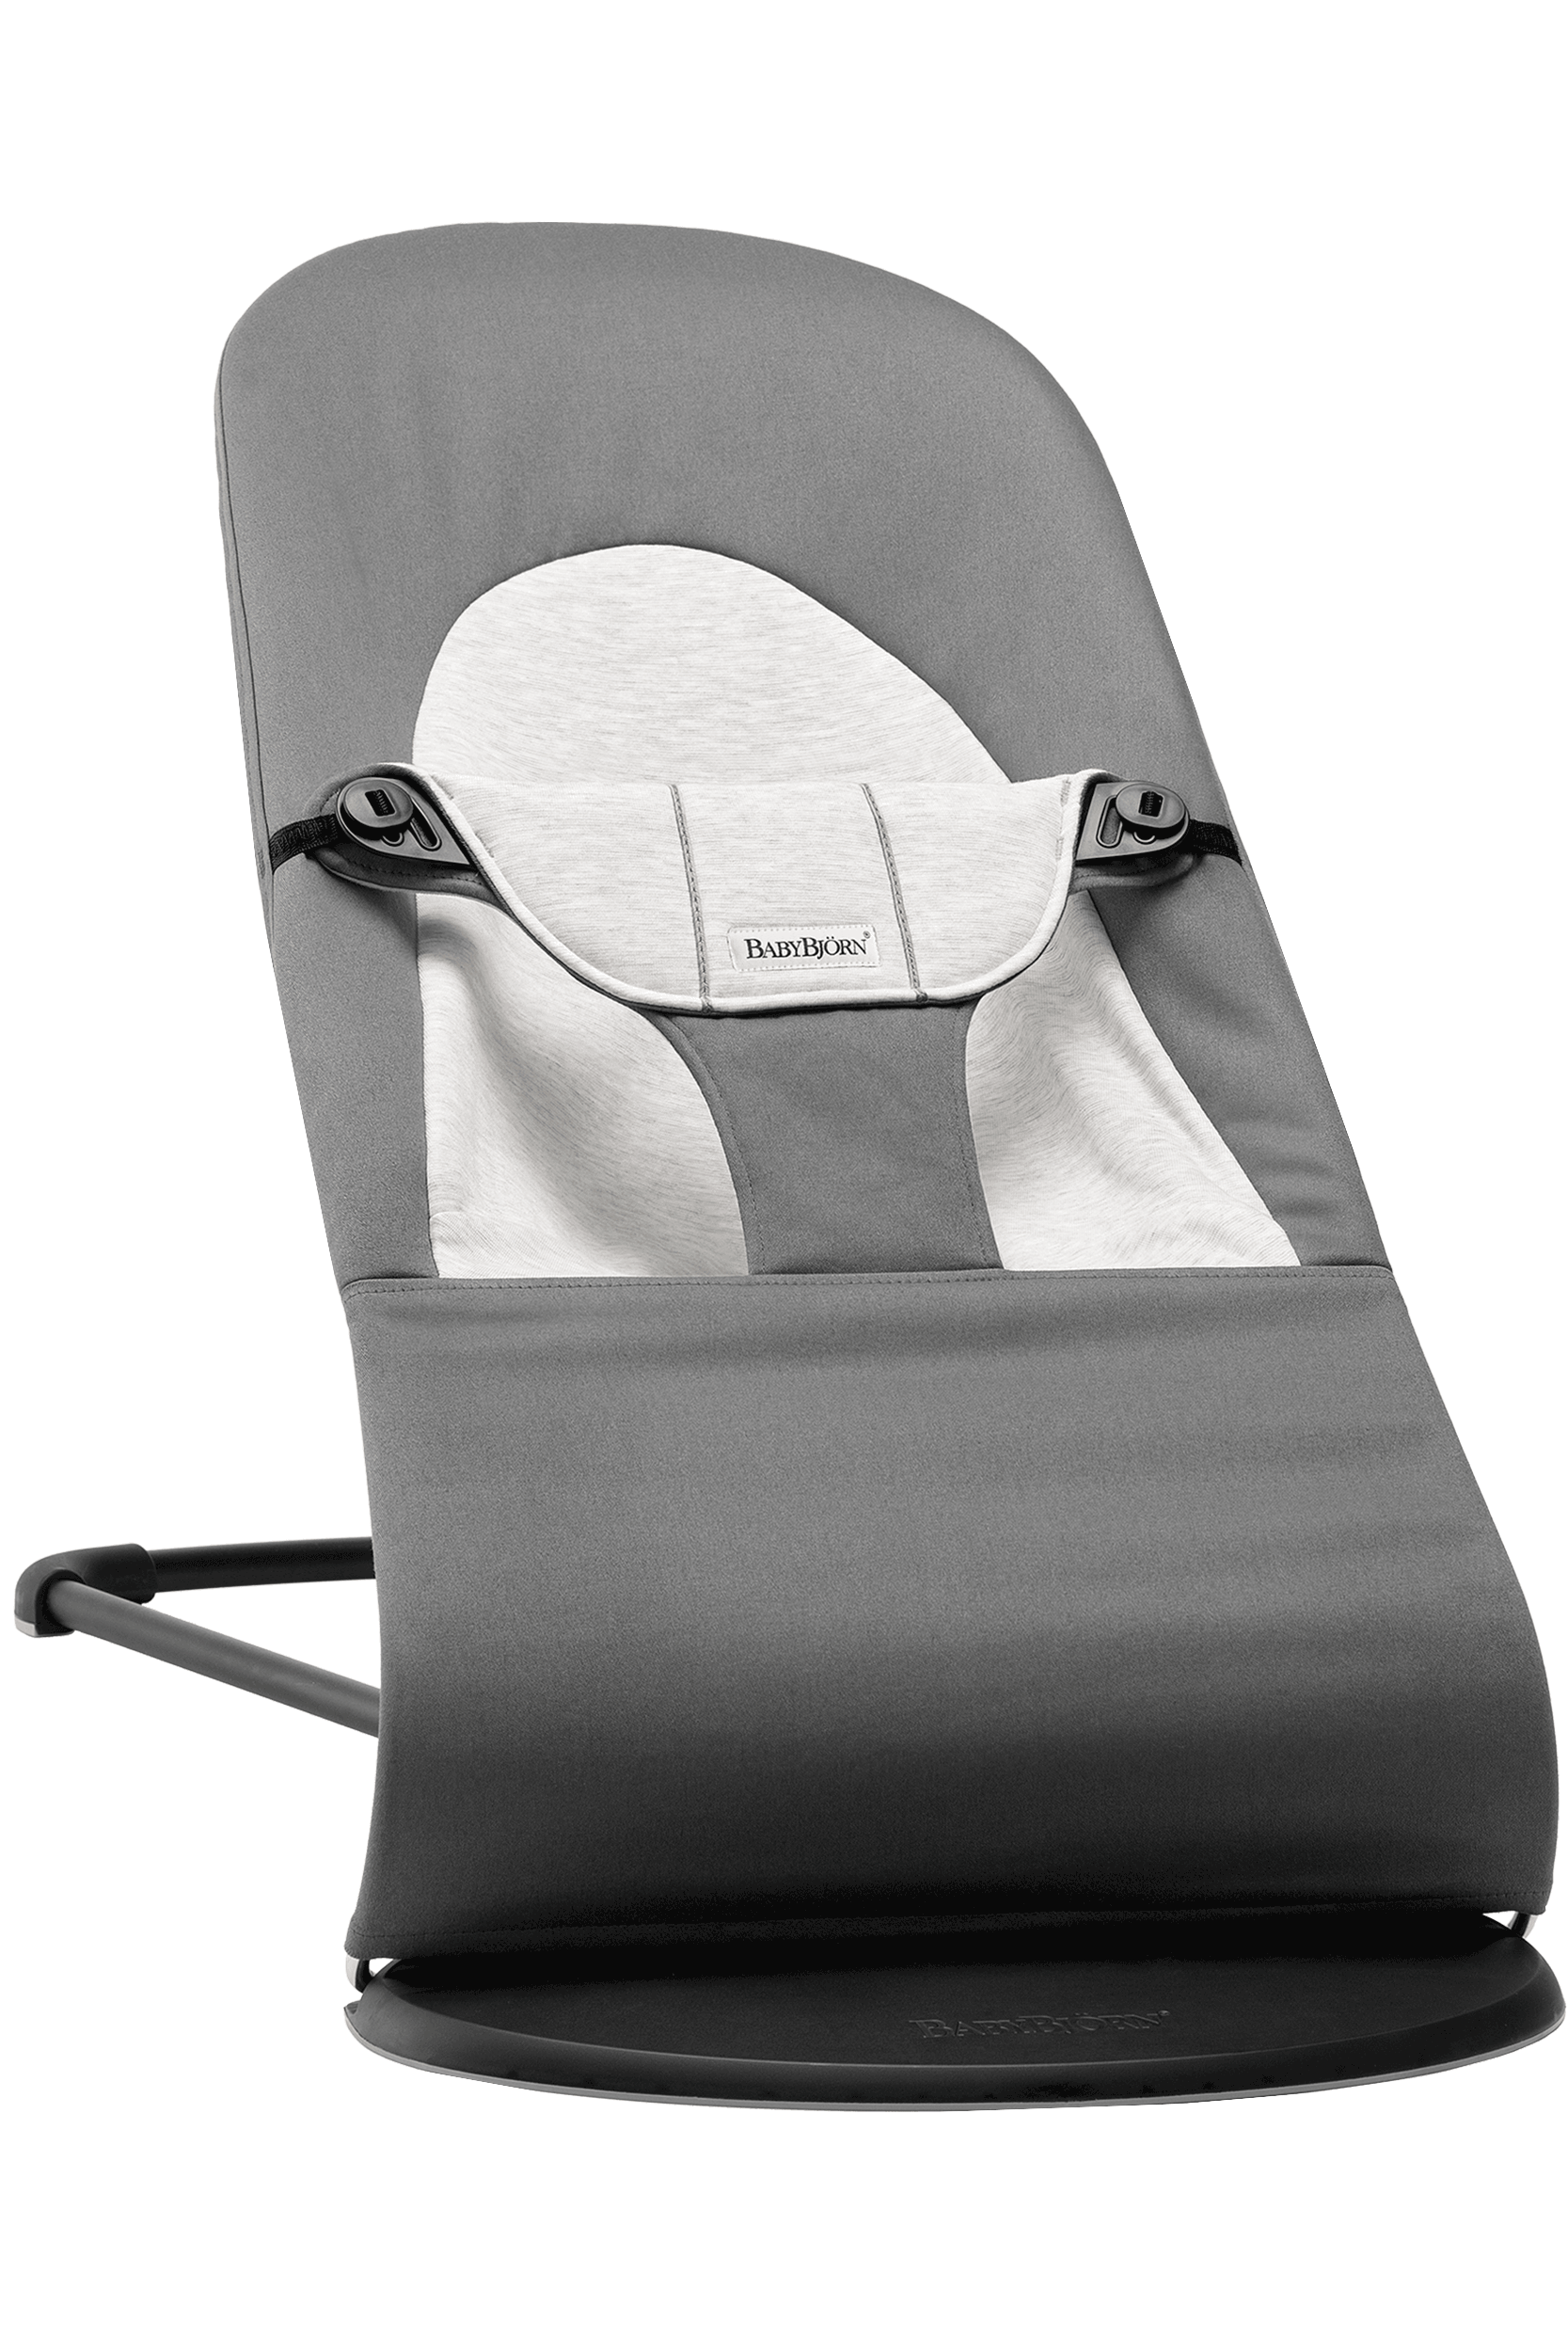 Soft transat physiologiqueBABYBJÖRN – un Balance OX80wNPnk